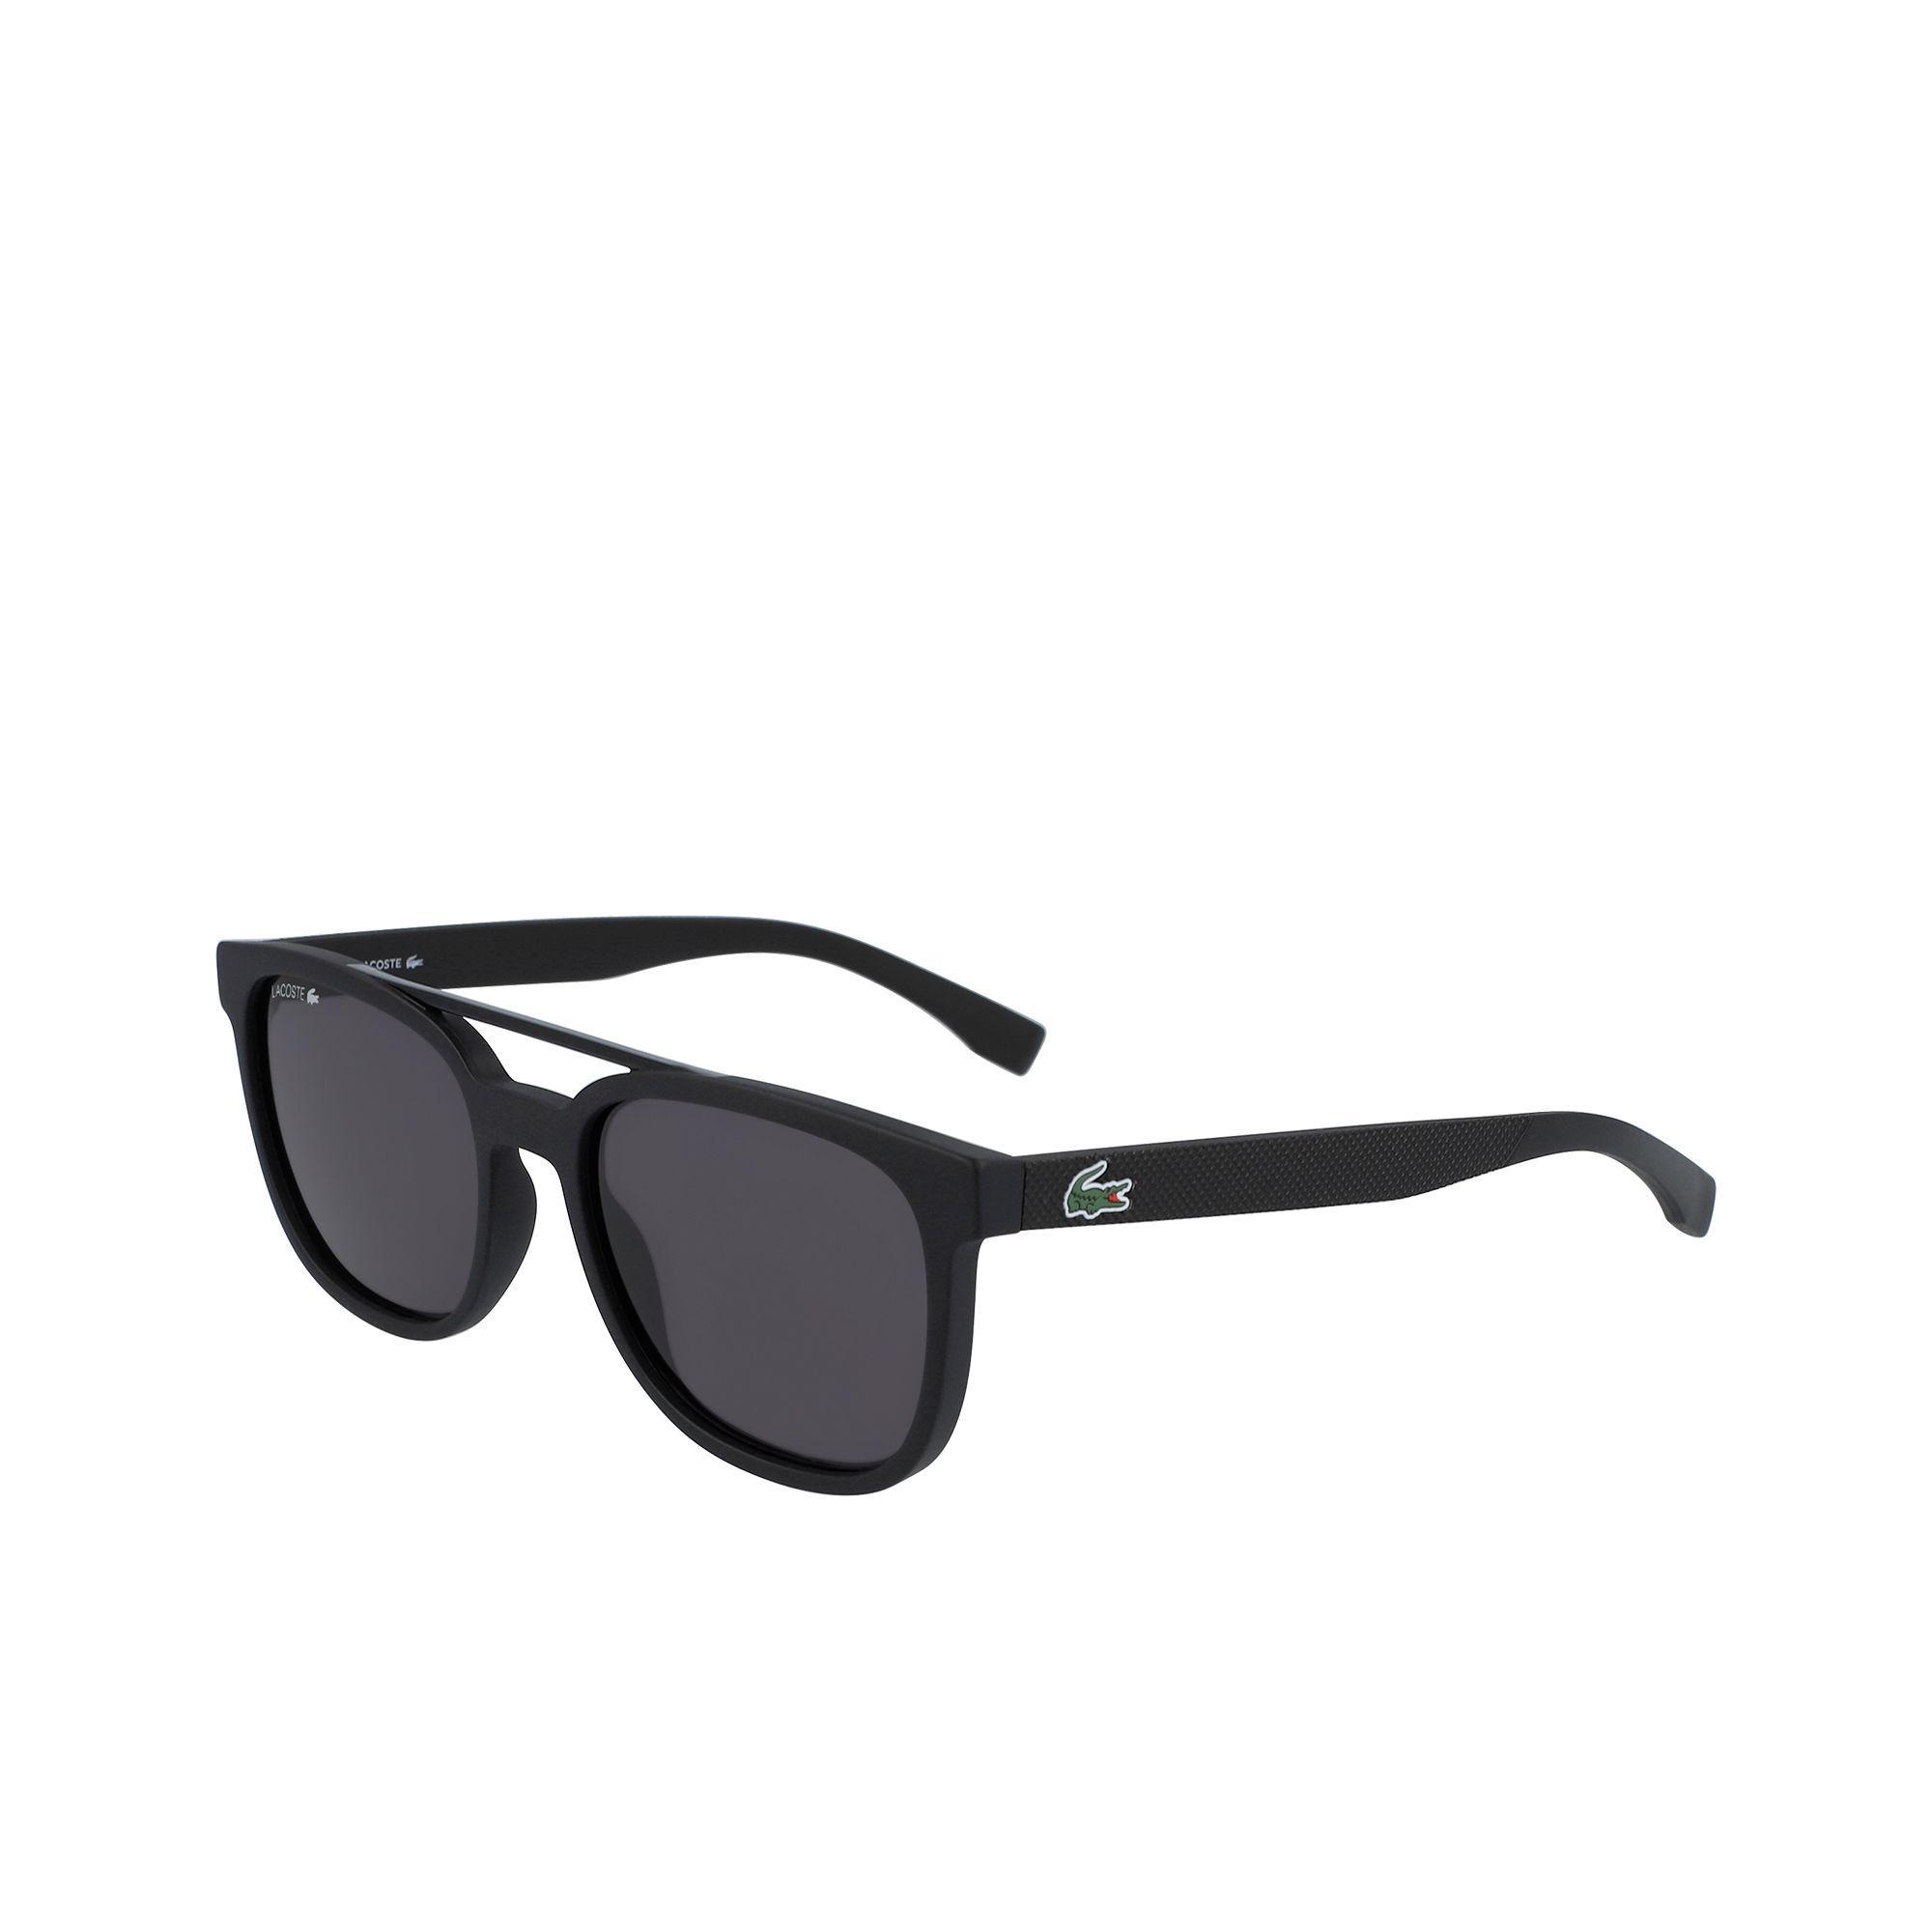 47b9d79418 Lyst - Lacoste Plastic Petit Piqué L.12.12 Sunglasses in Black